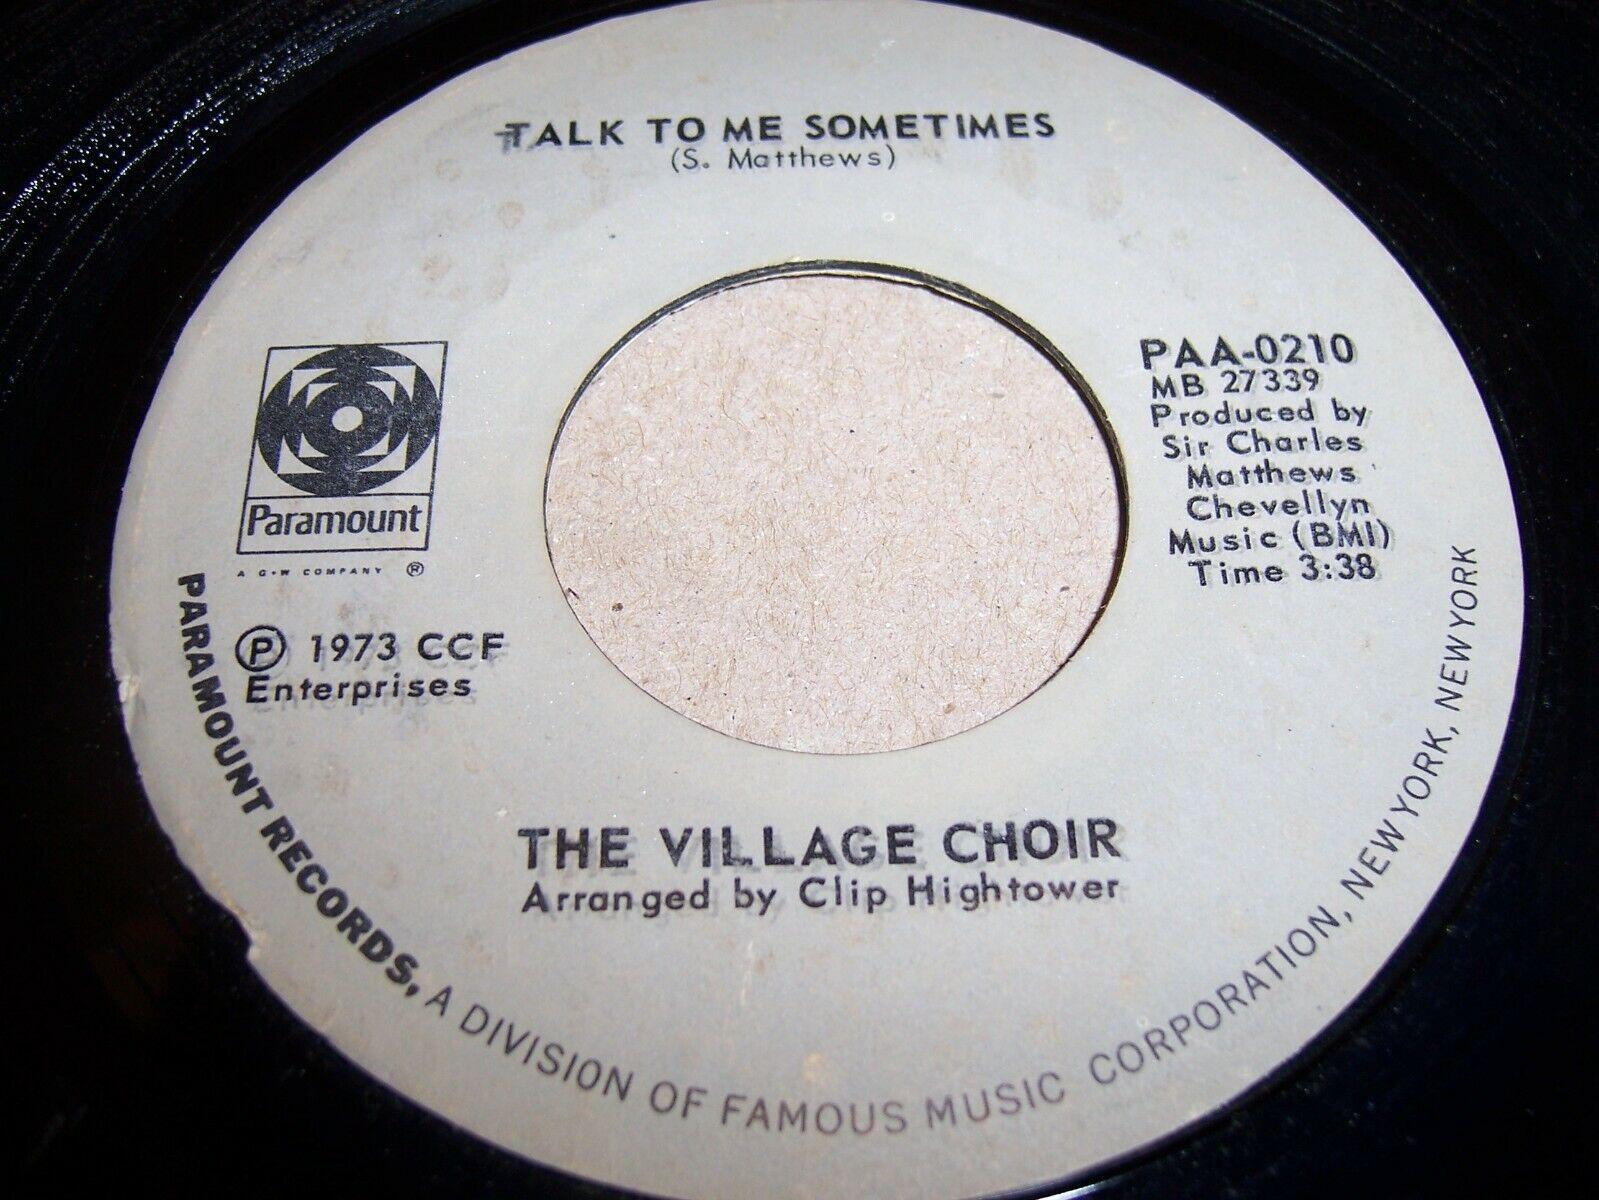 THE VILLAGE CHOIR- TALK TO ME SOMETIMES- 73 SOUL 45, PARAMOUNT PAA-0210 VG-/VG  - $8.99